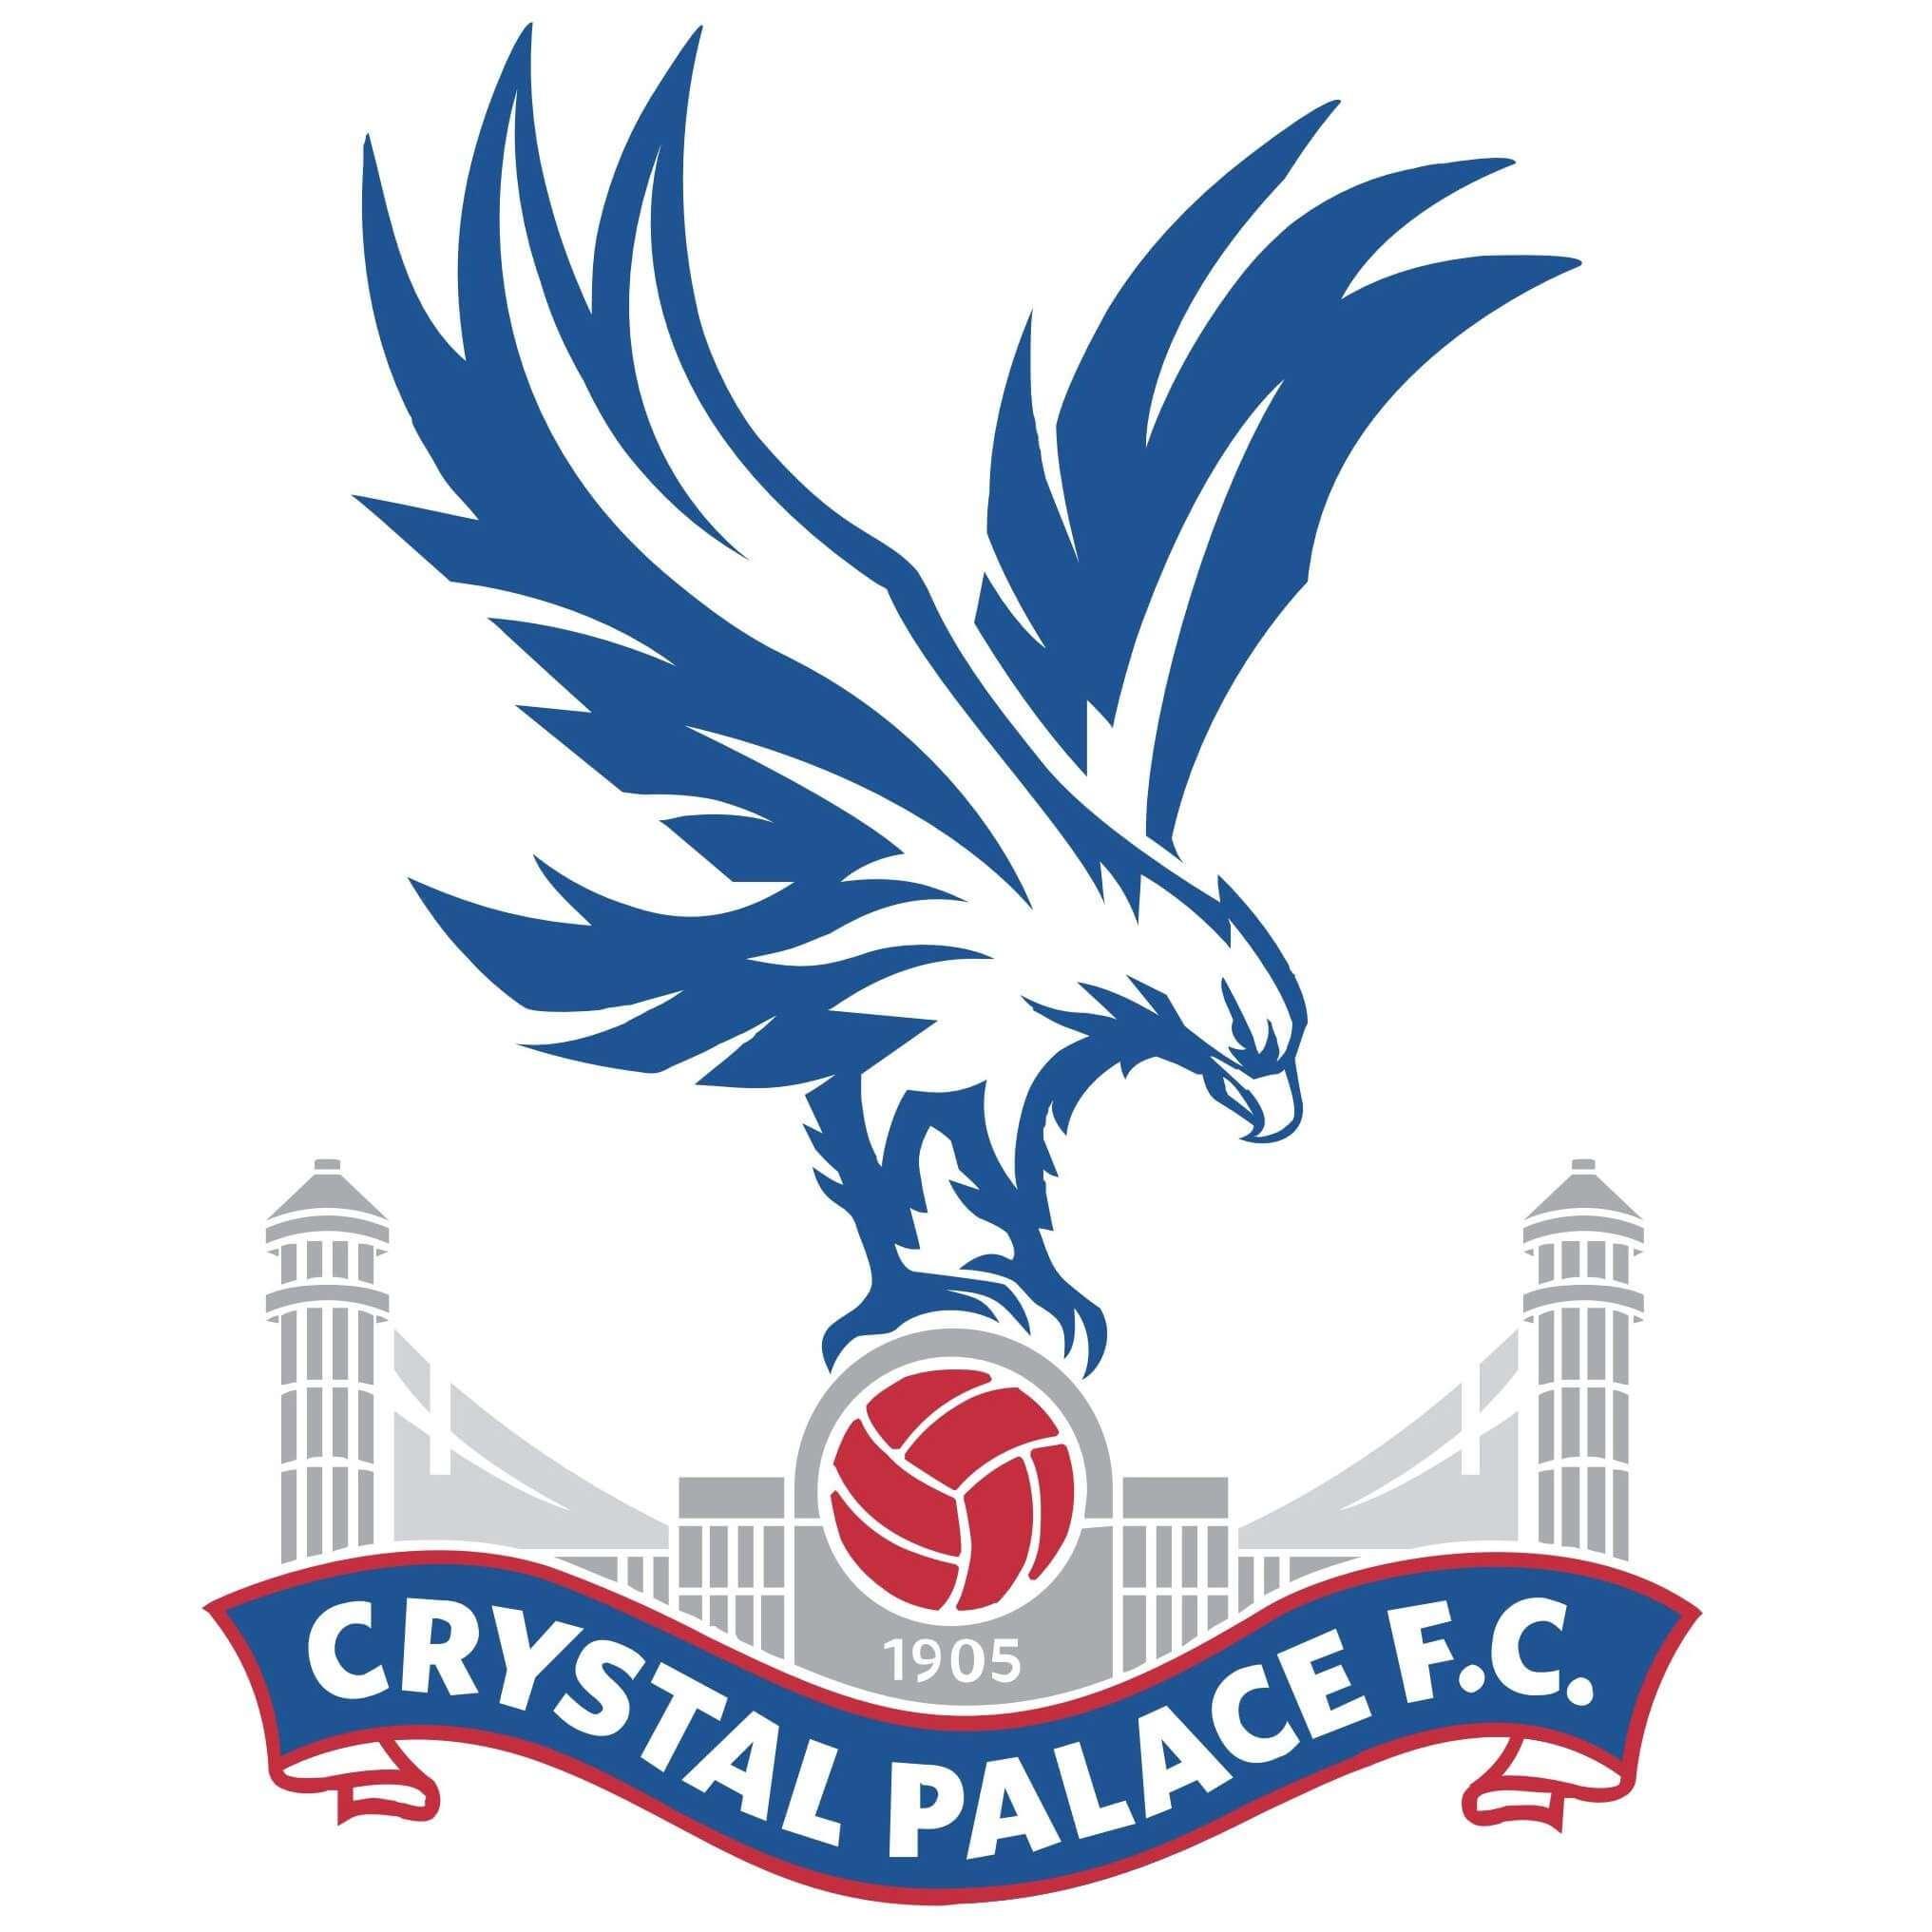 Crystal-Palace-Football-Club-Logo